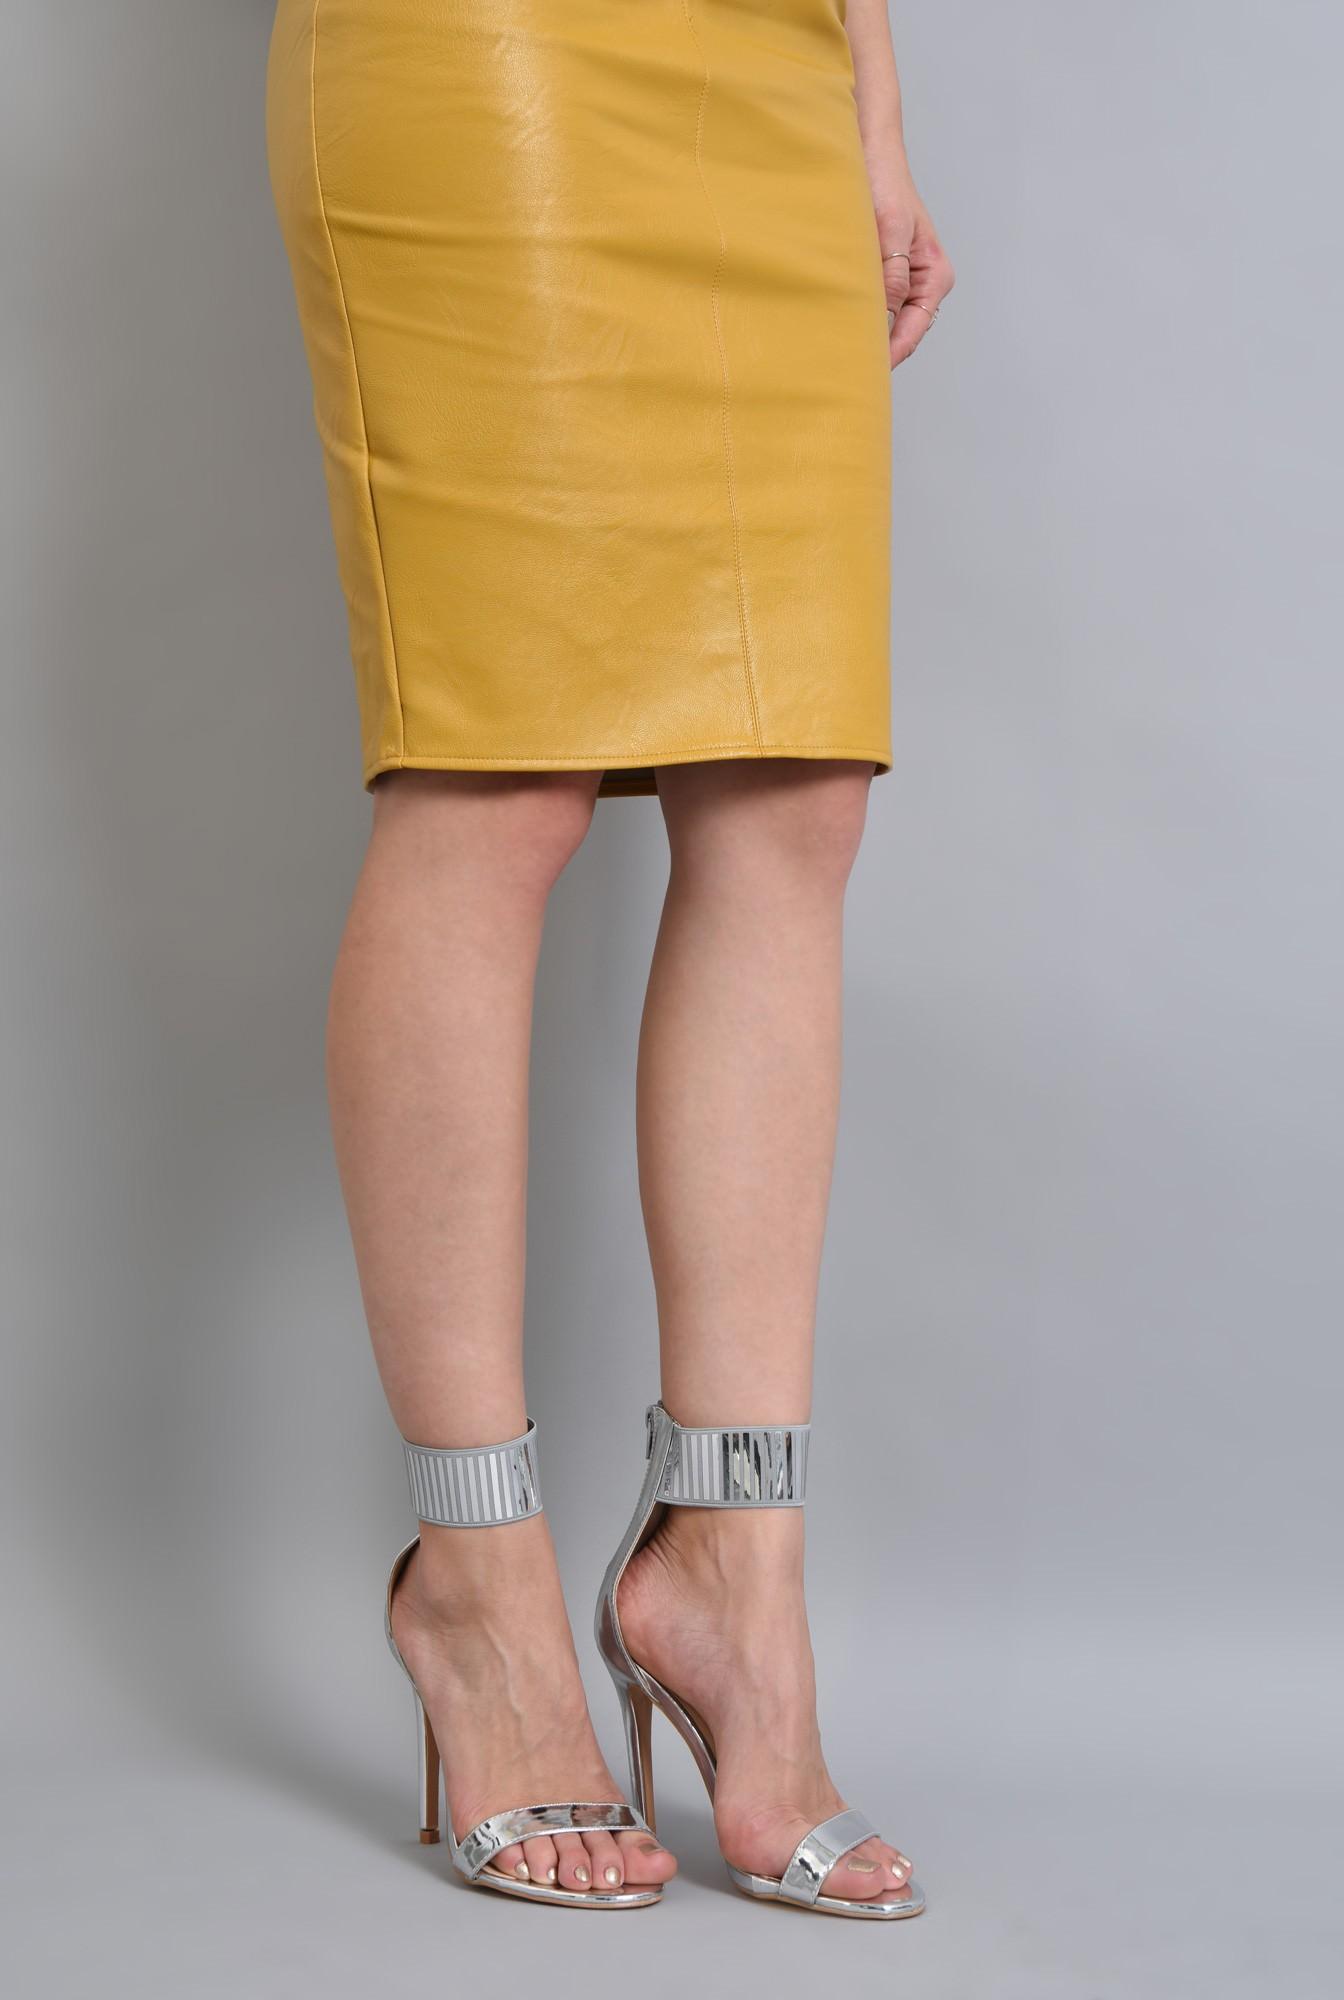 4 - sandale elegante, argintii, metalizate, stiletto